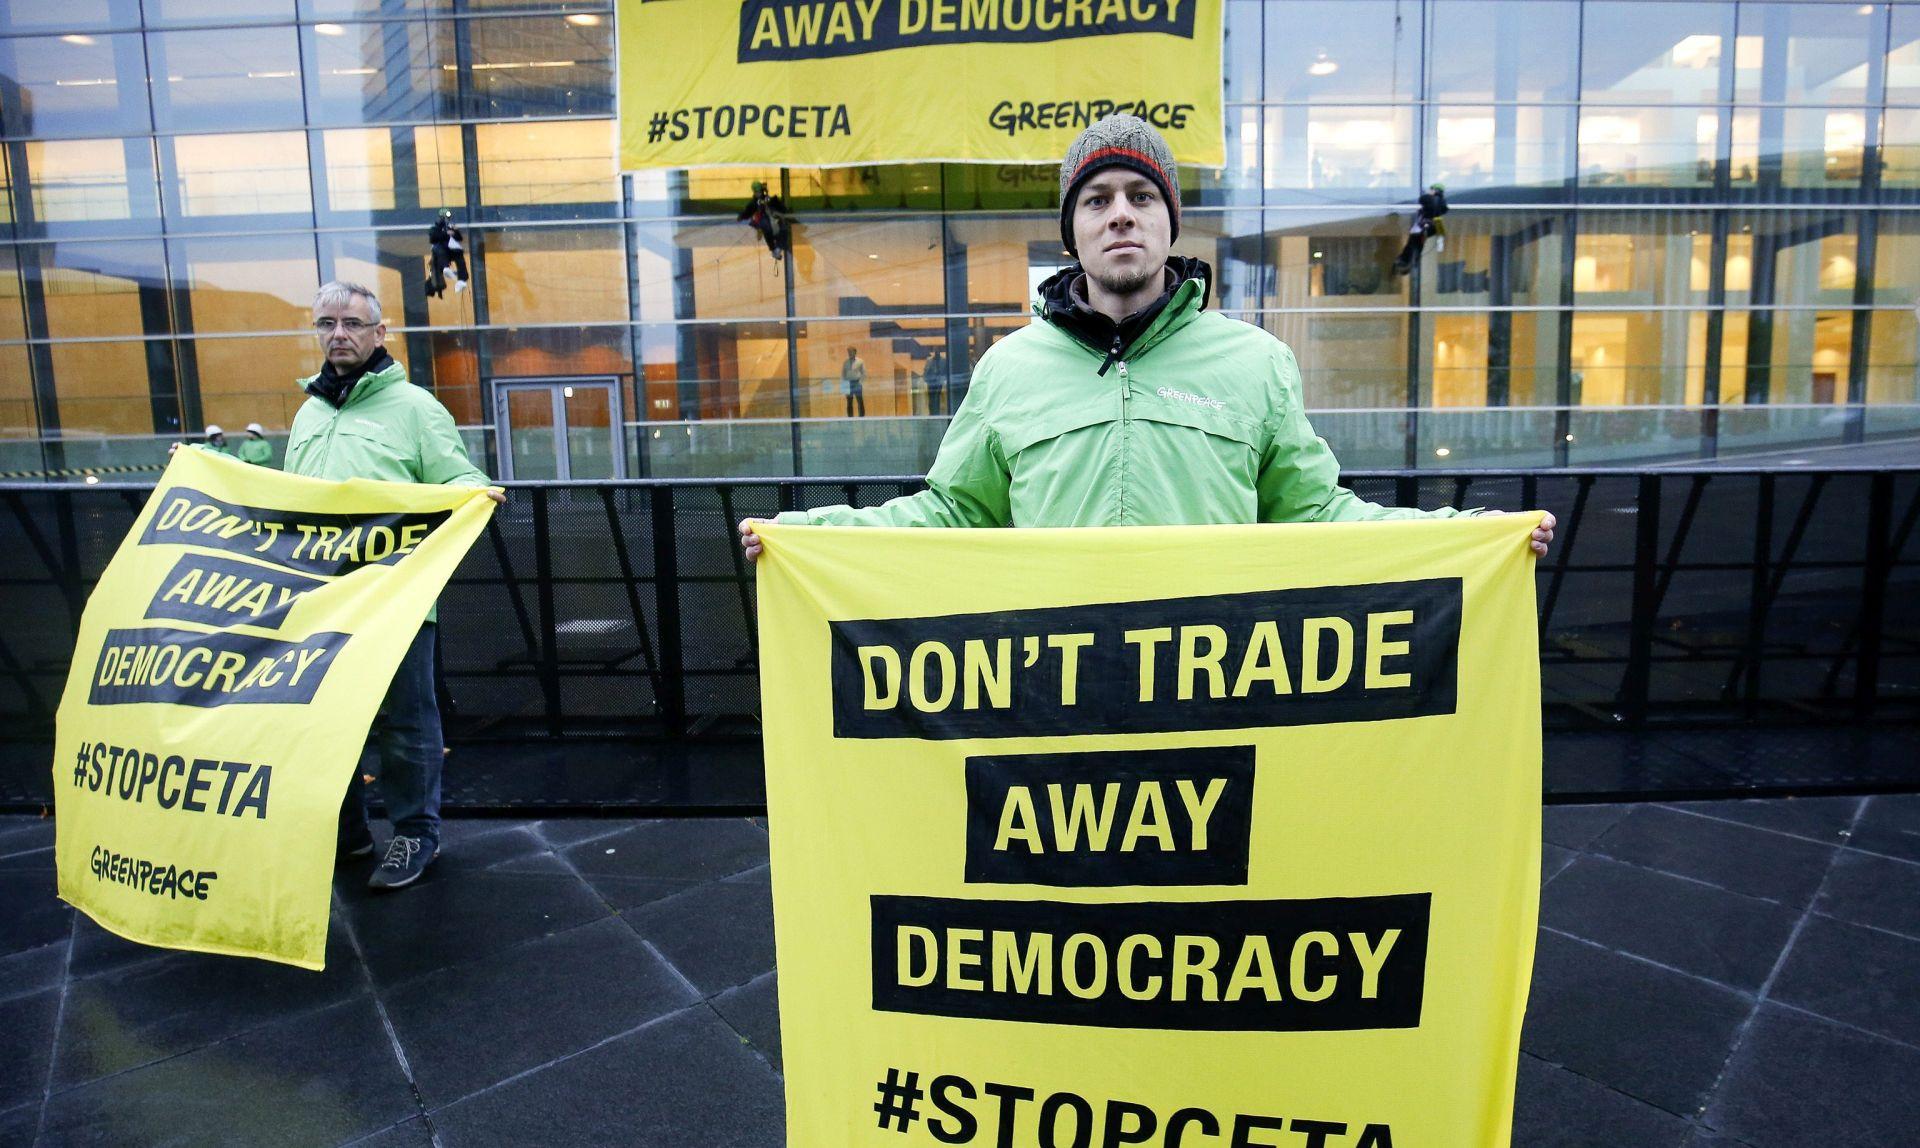 CETA: EU dao ultimatum Belgiji